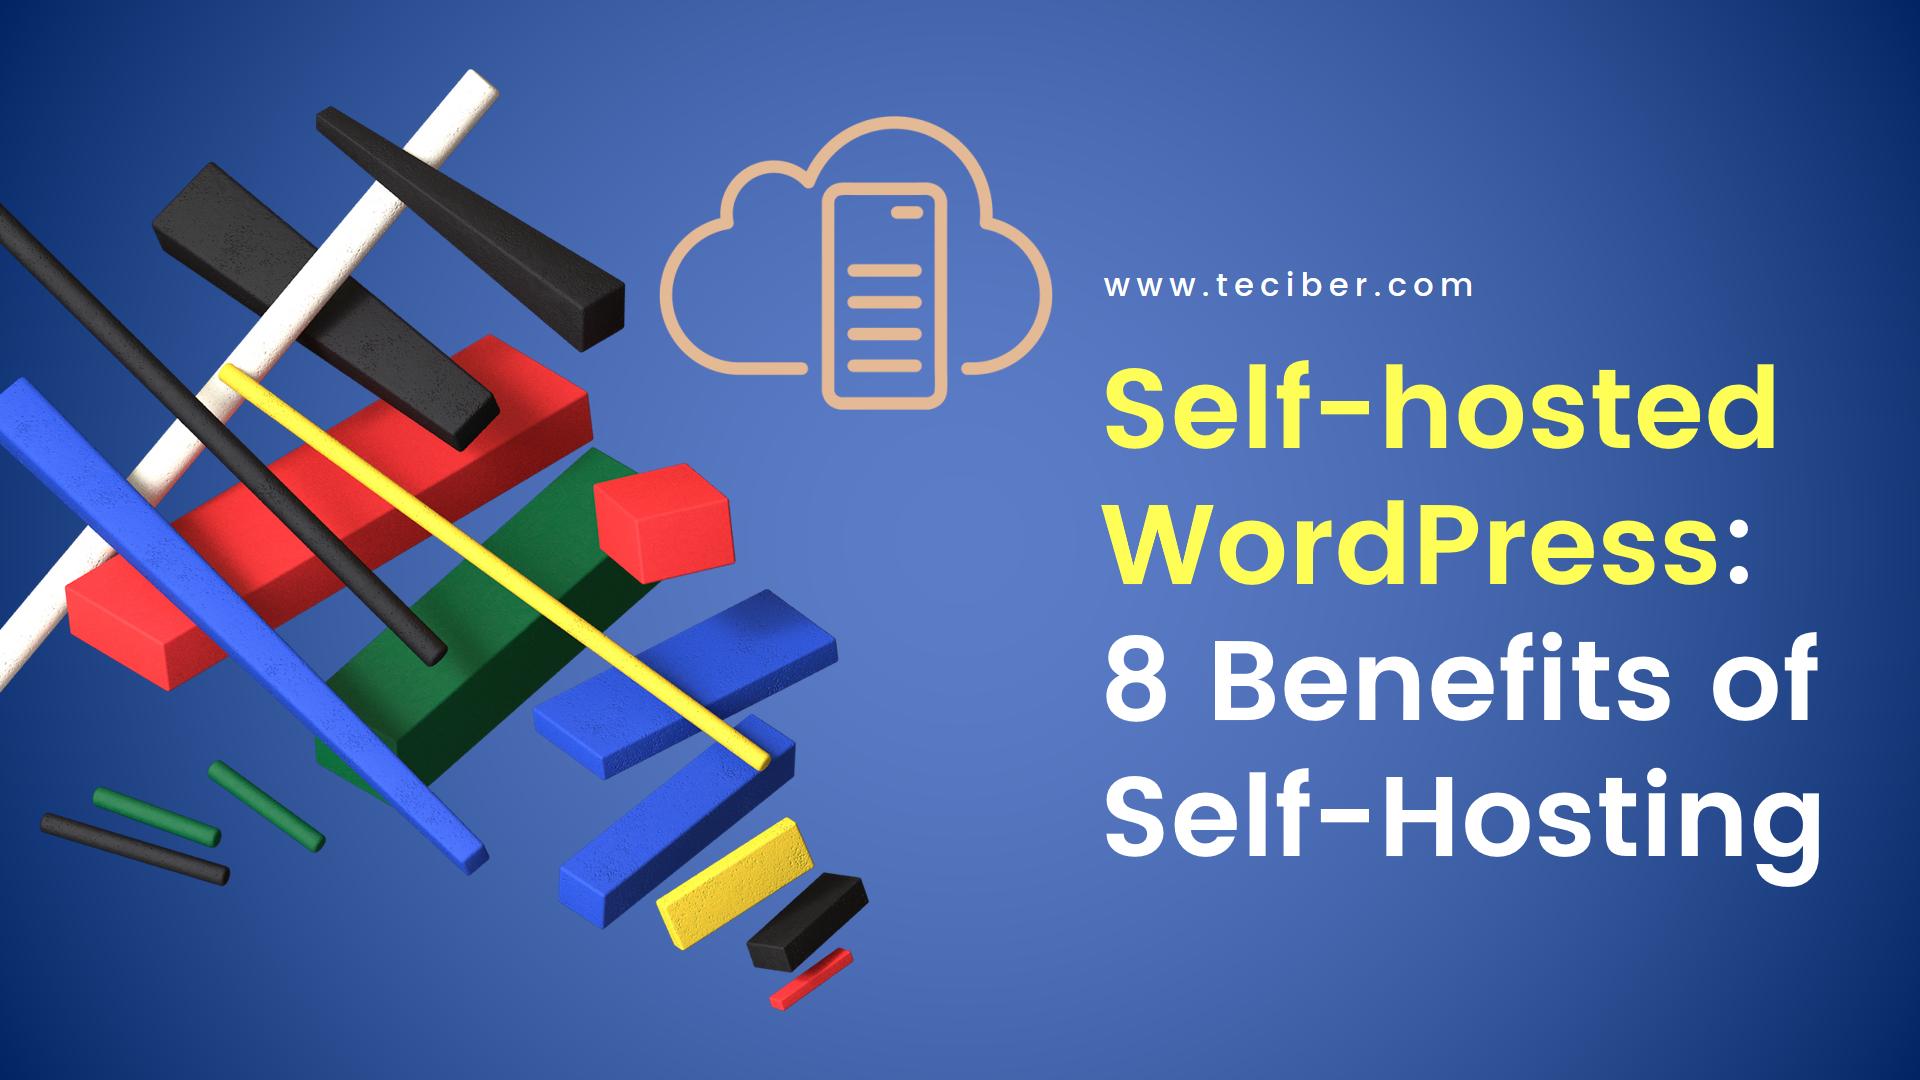 Self-hosted WordPress: 8 Benefits of Self-Hosting